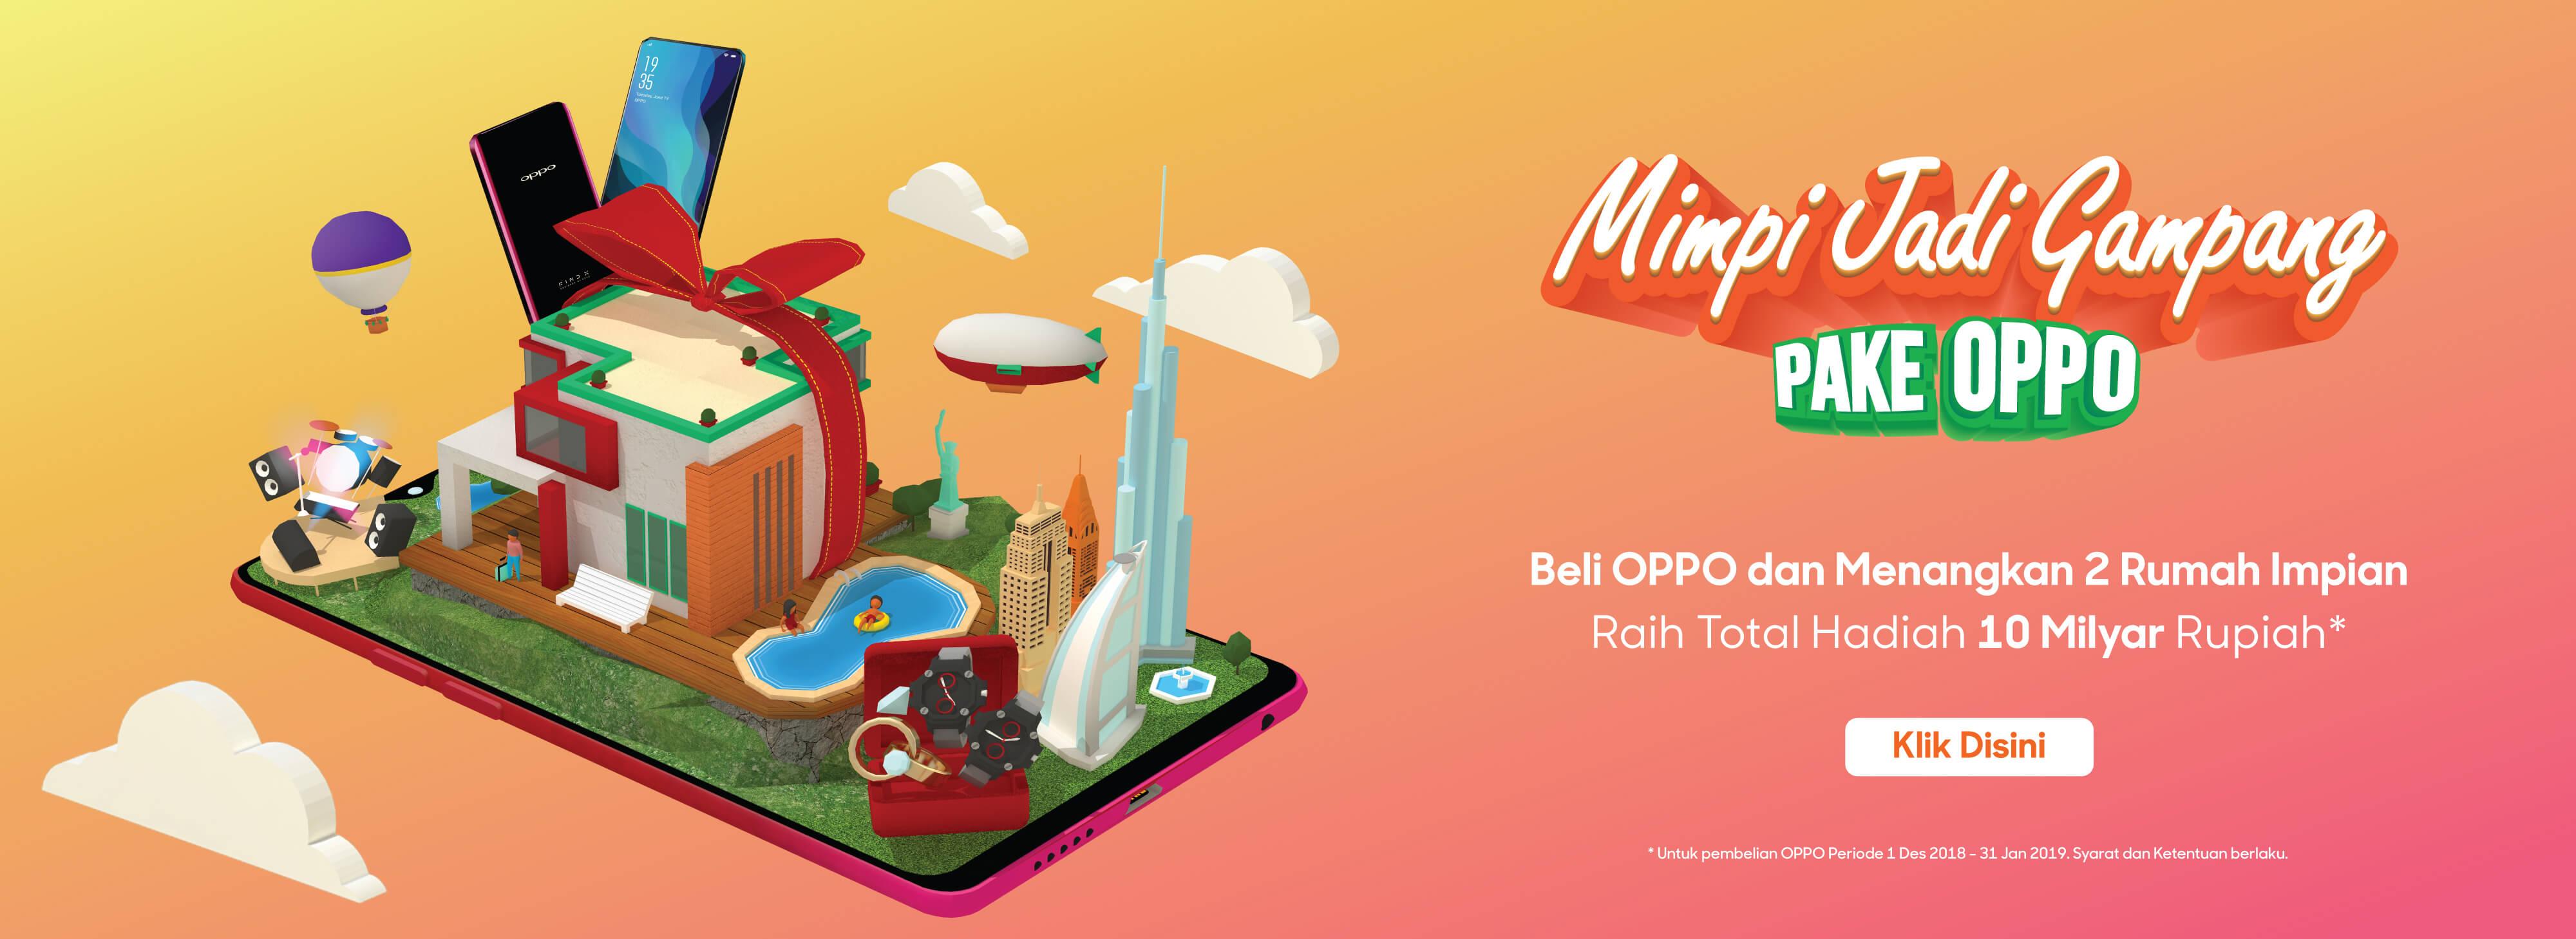 Oppo Mobile For Smartphones Accessories Oppo Indonesia Oppo